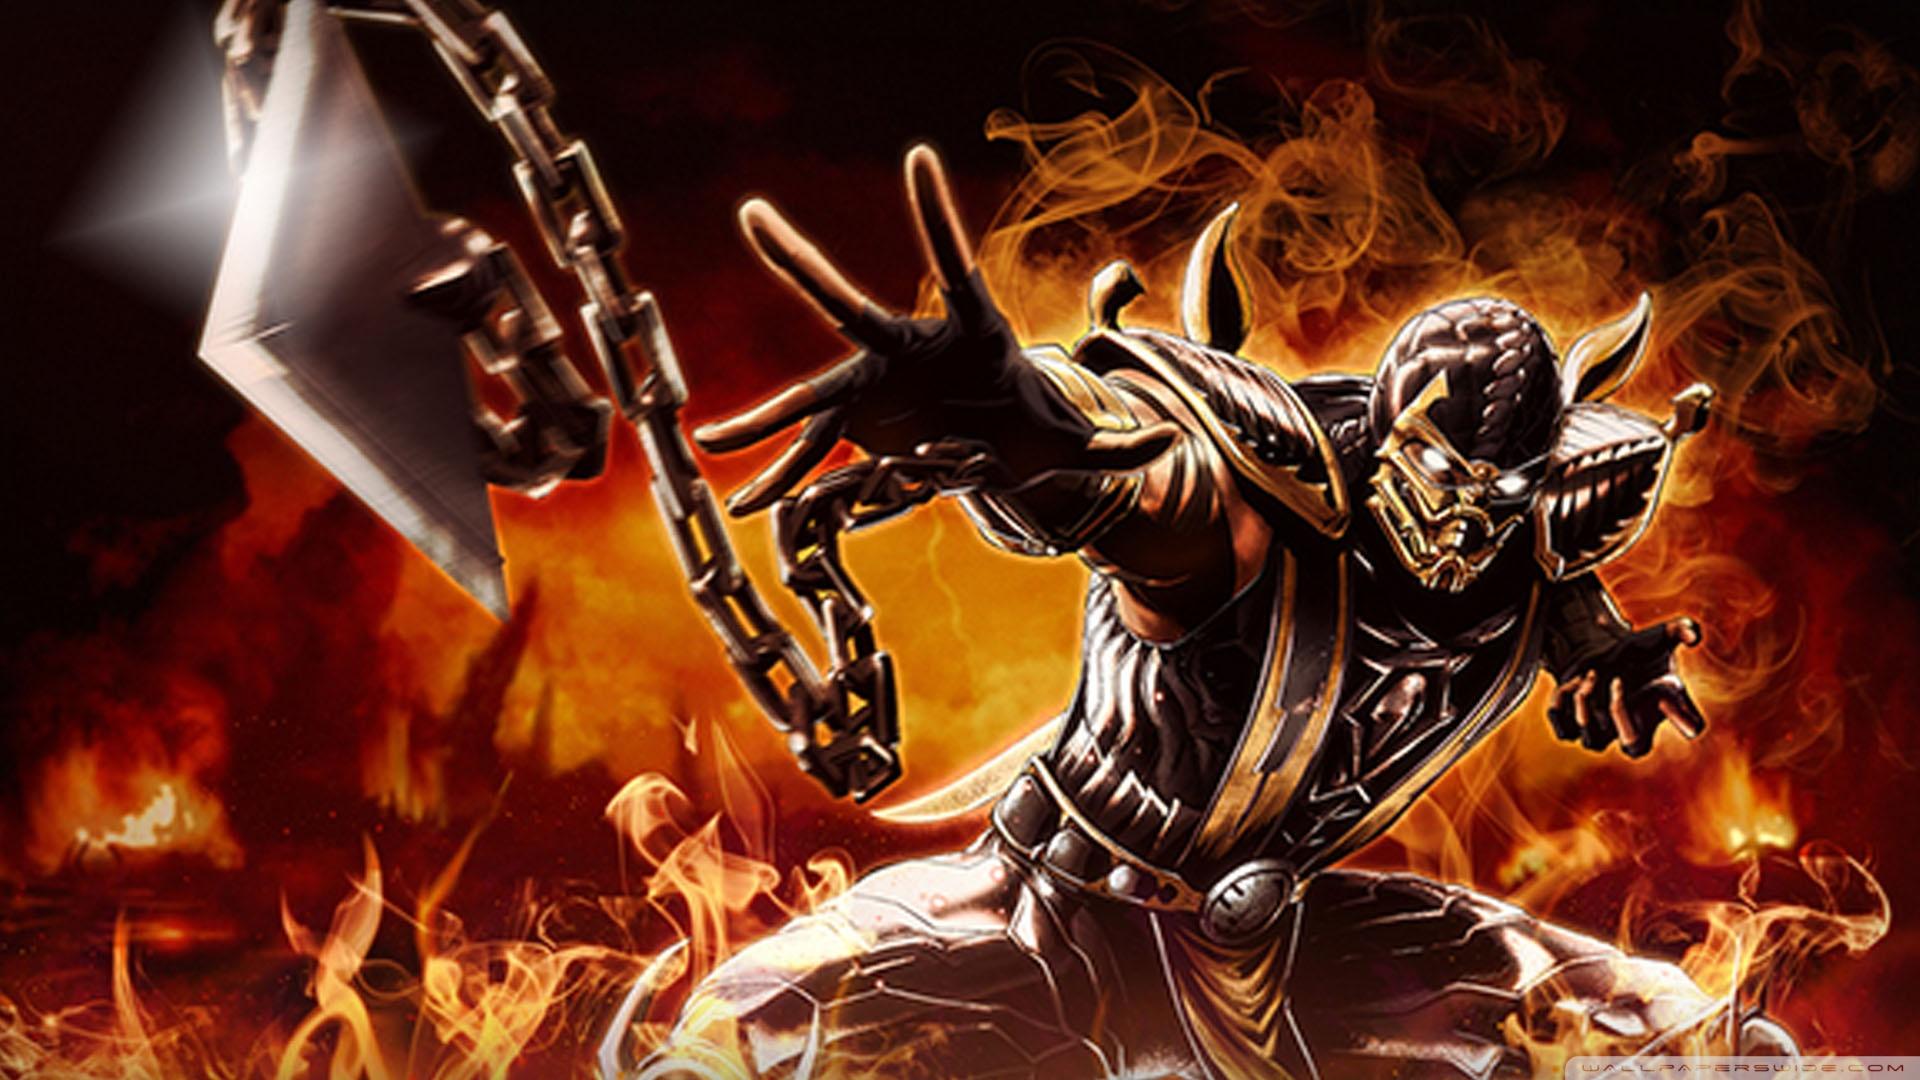 Mortal Kombat X New Character Gameplay UnitedFanboyzcom 1920x1080